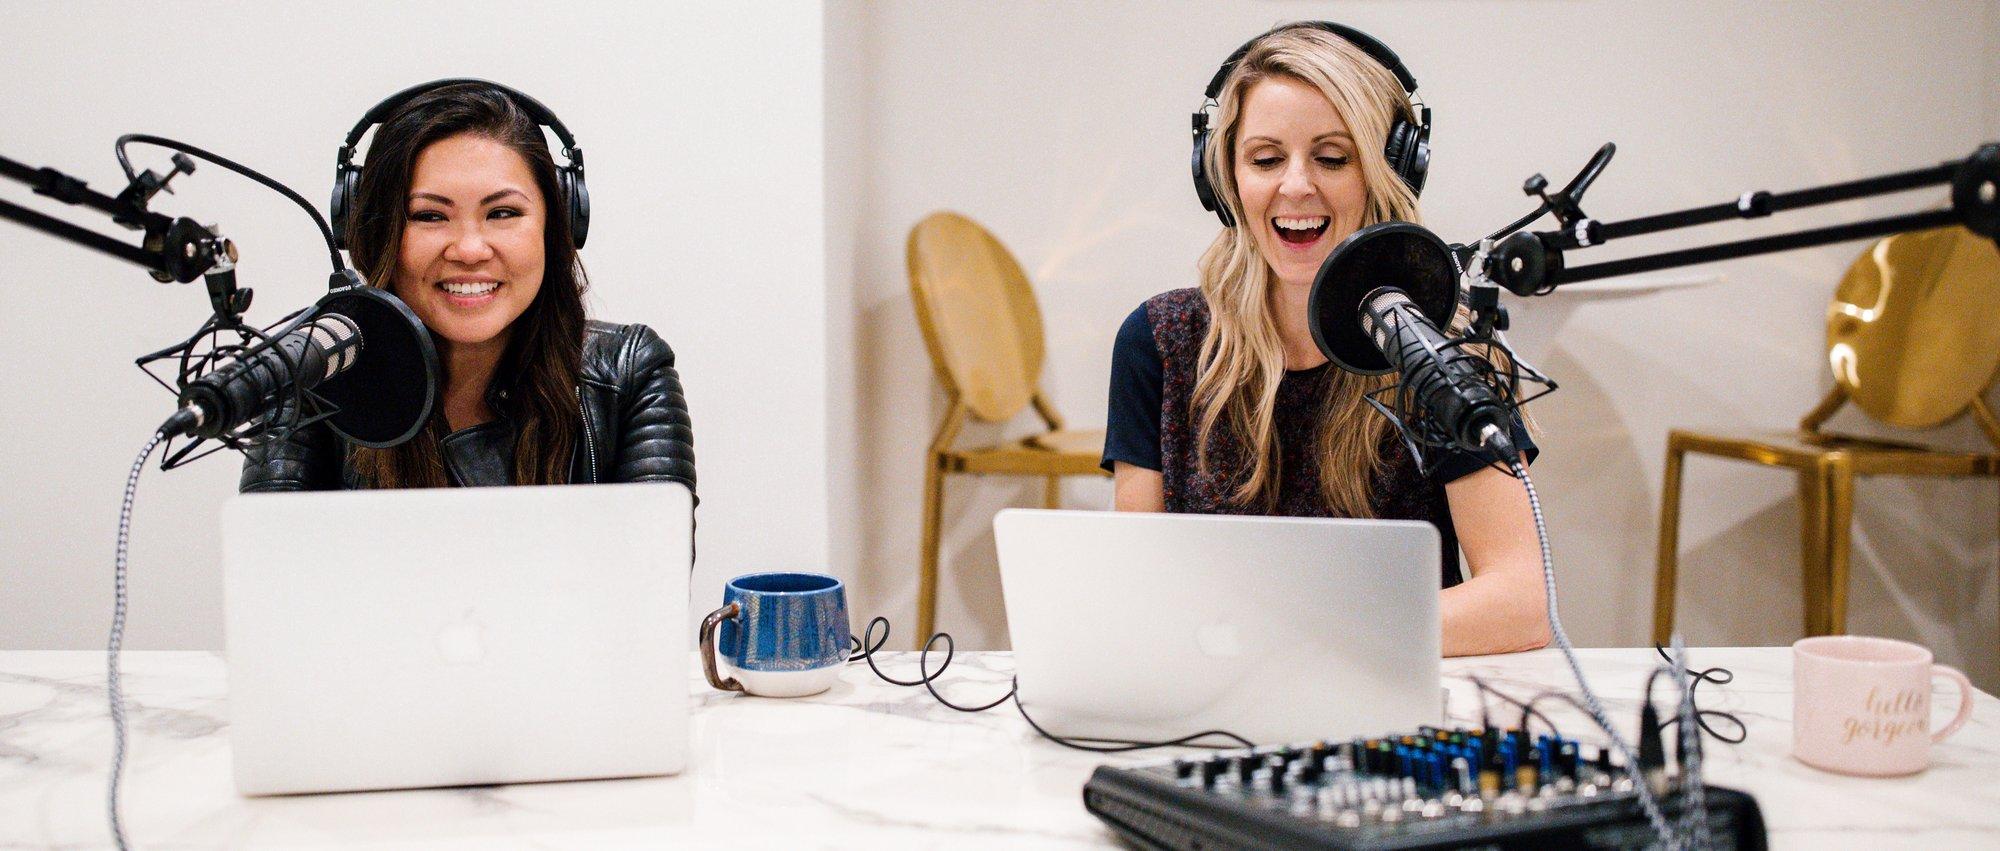 Amanda and Alicia, Hosts of EvolveHer Unpacked Podcast